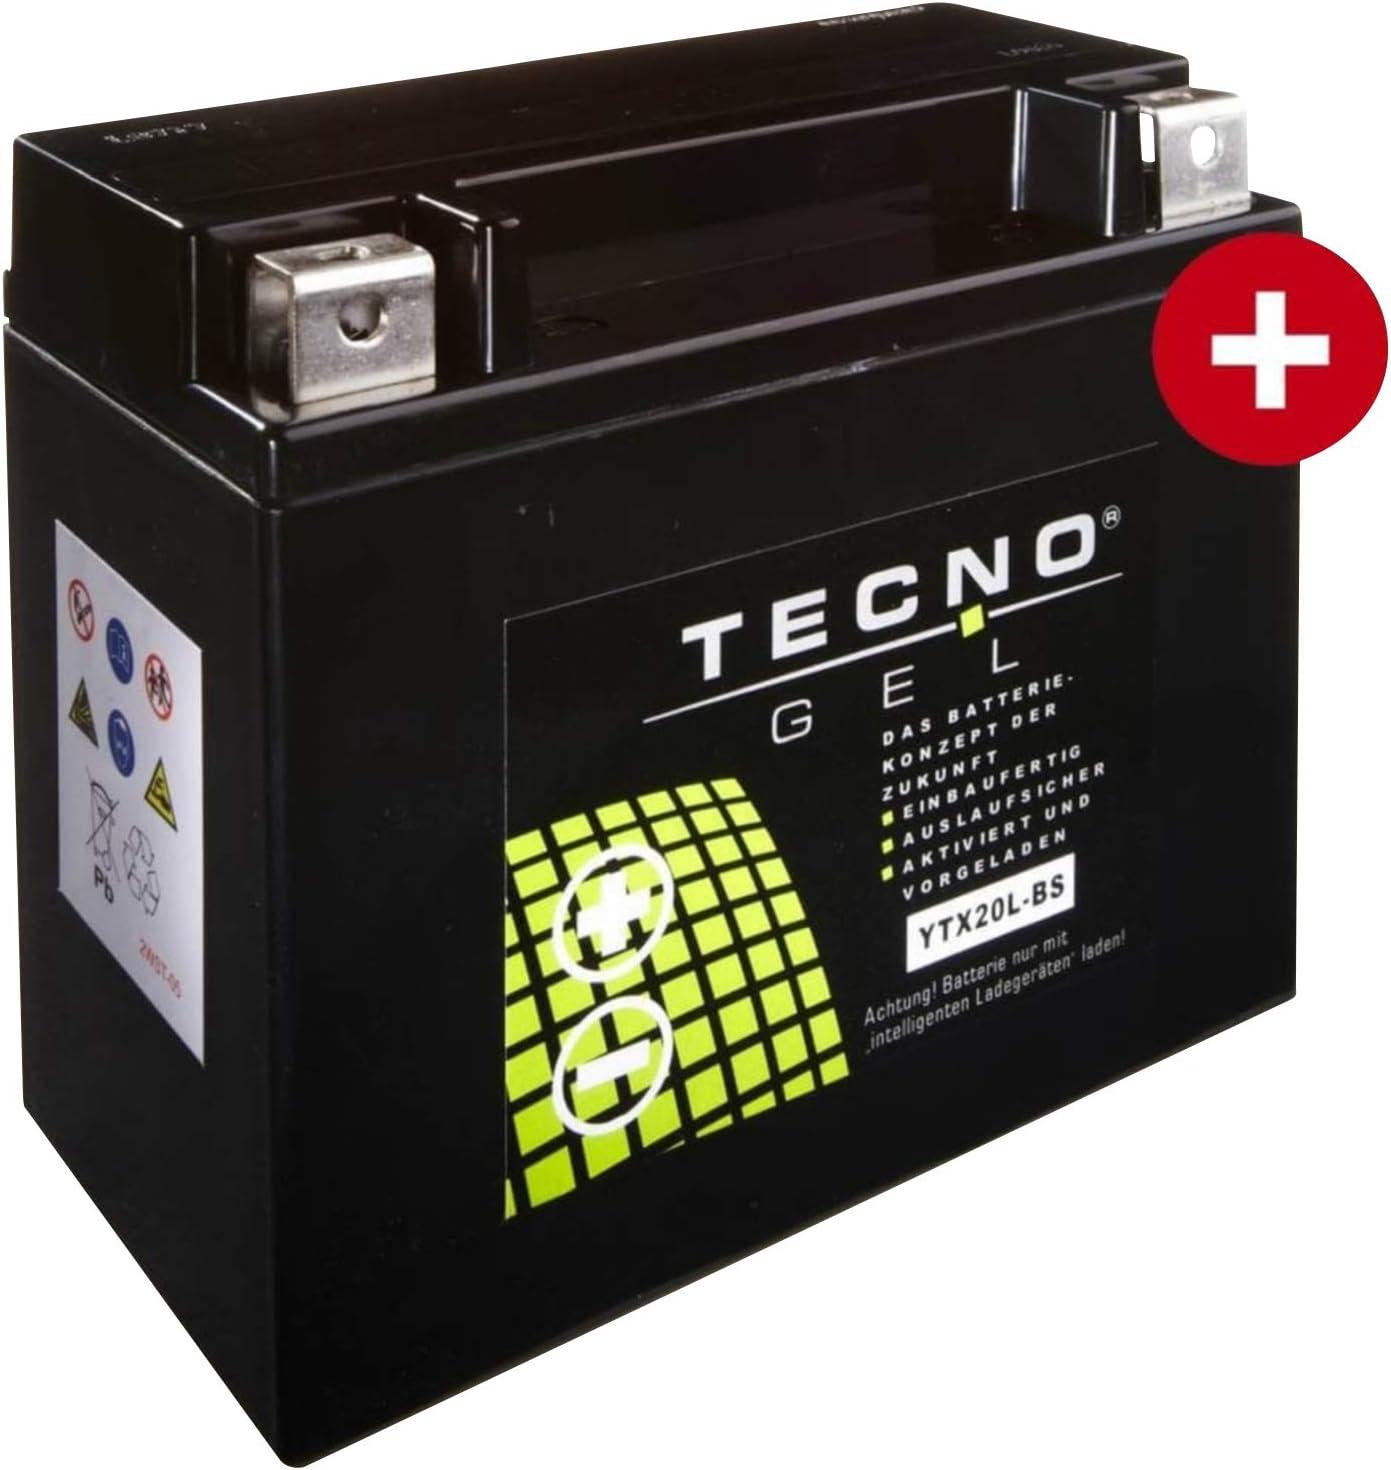 Tecno Ytx20l Bs Gel Batterie Flss 1800 Softail Slim S Abs 2016 Auto